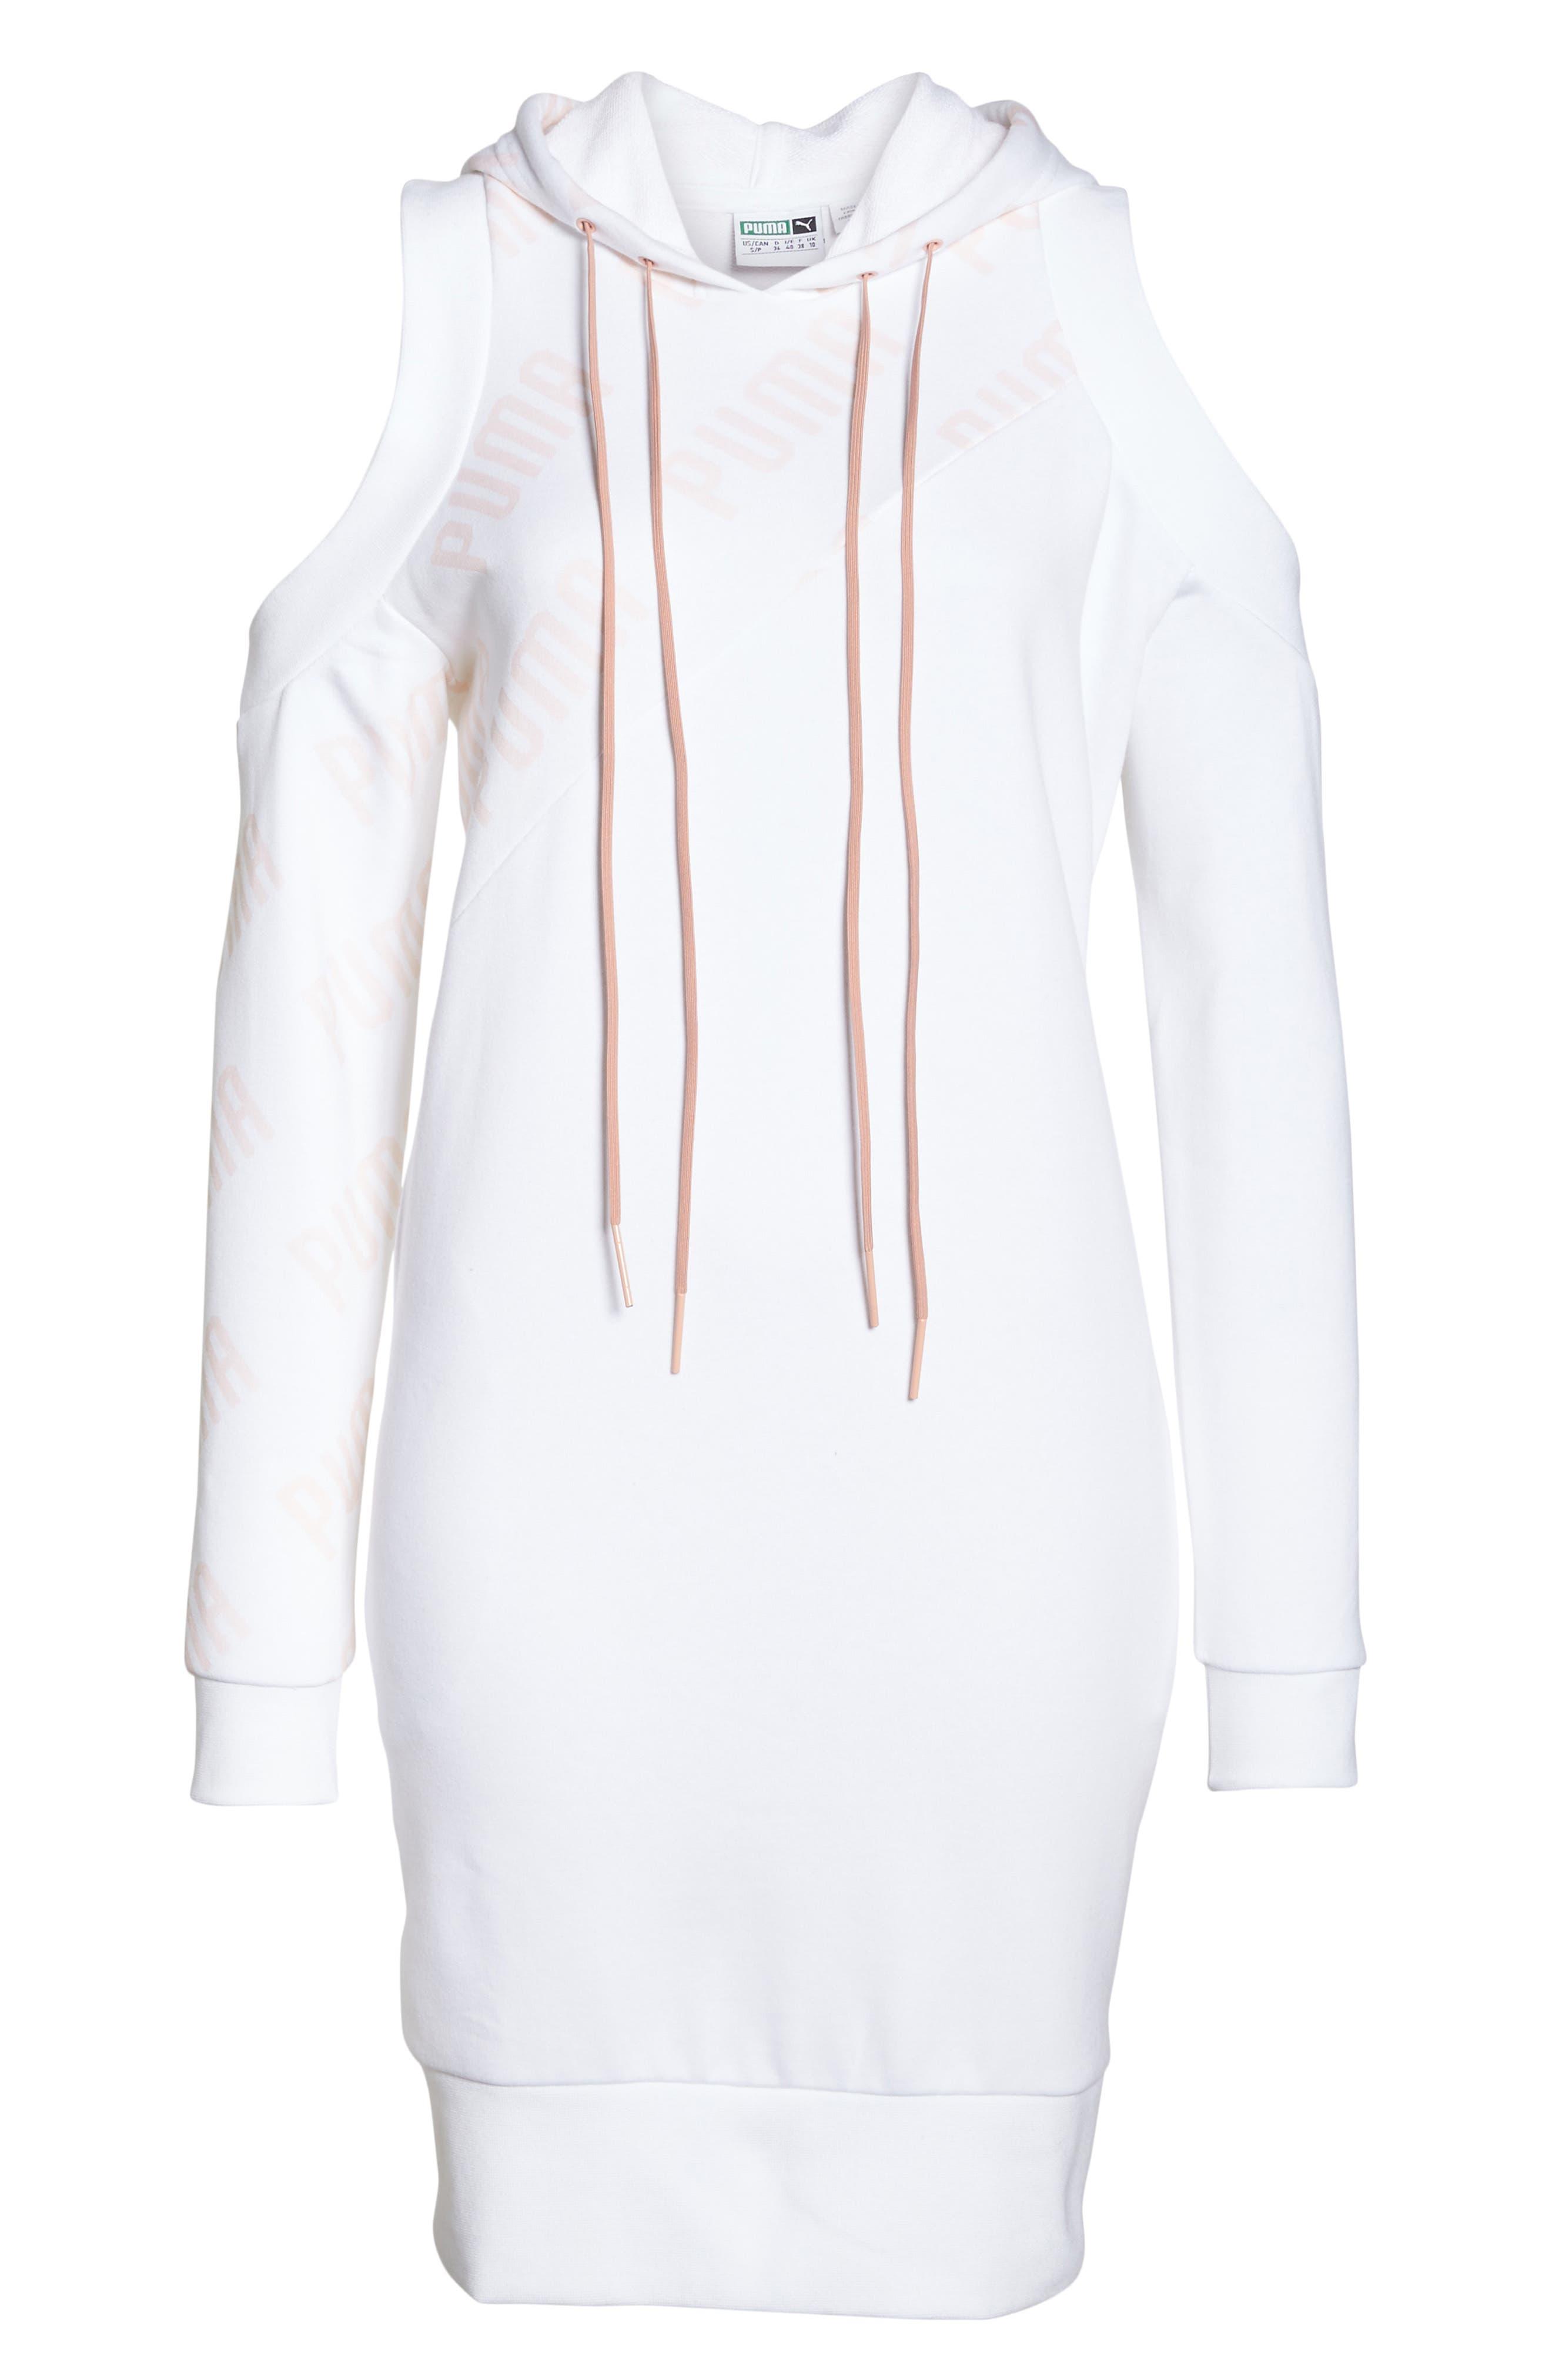 En Pointe Drawstring Dress,                             Alternate thumbnail 7, color,                             Puma White